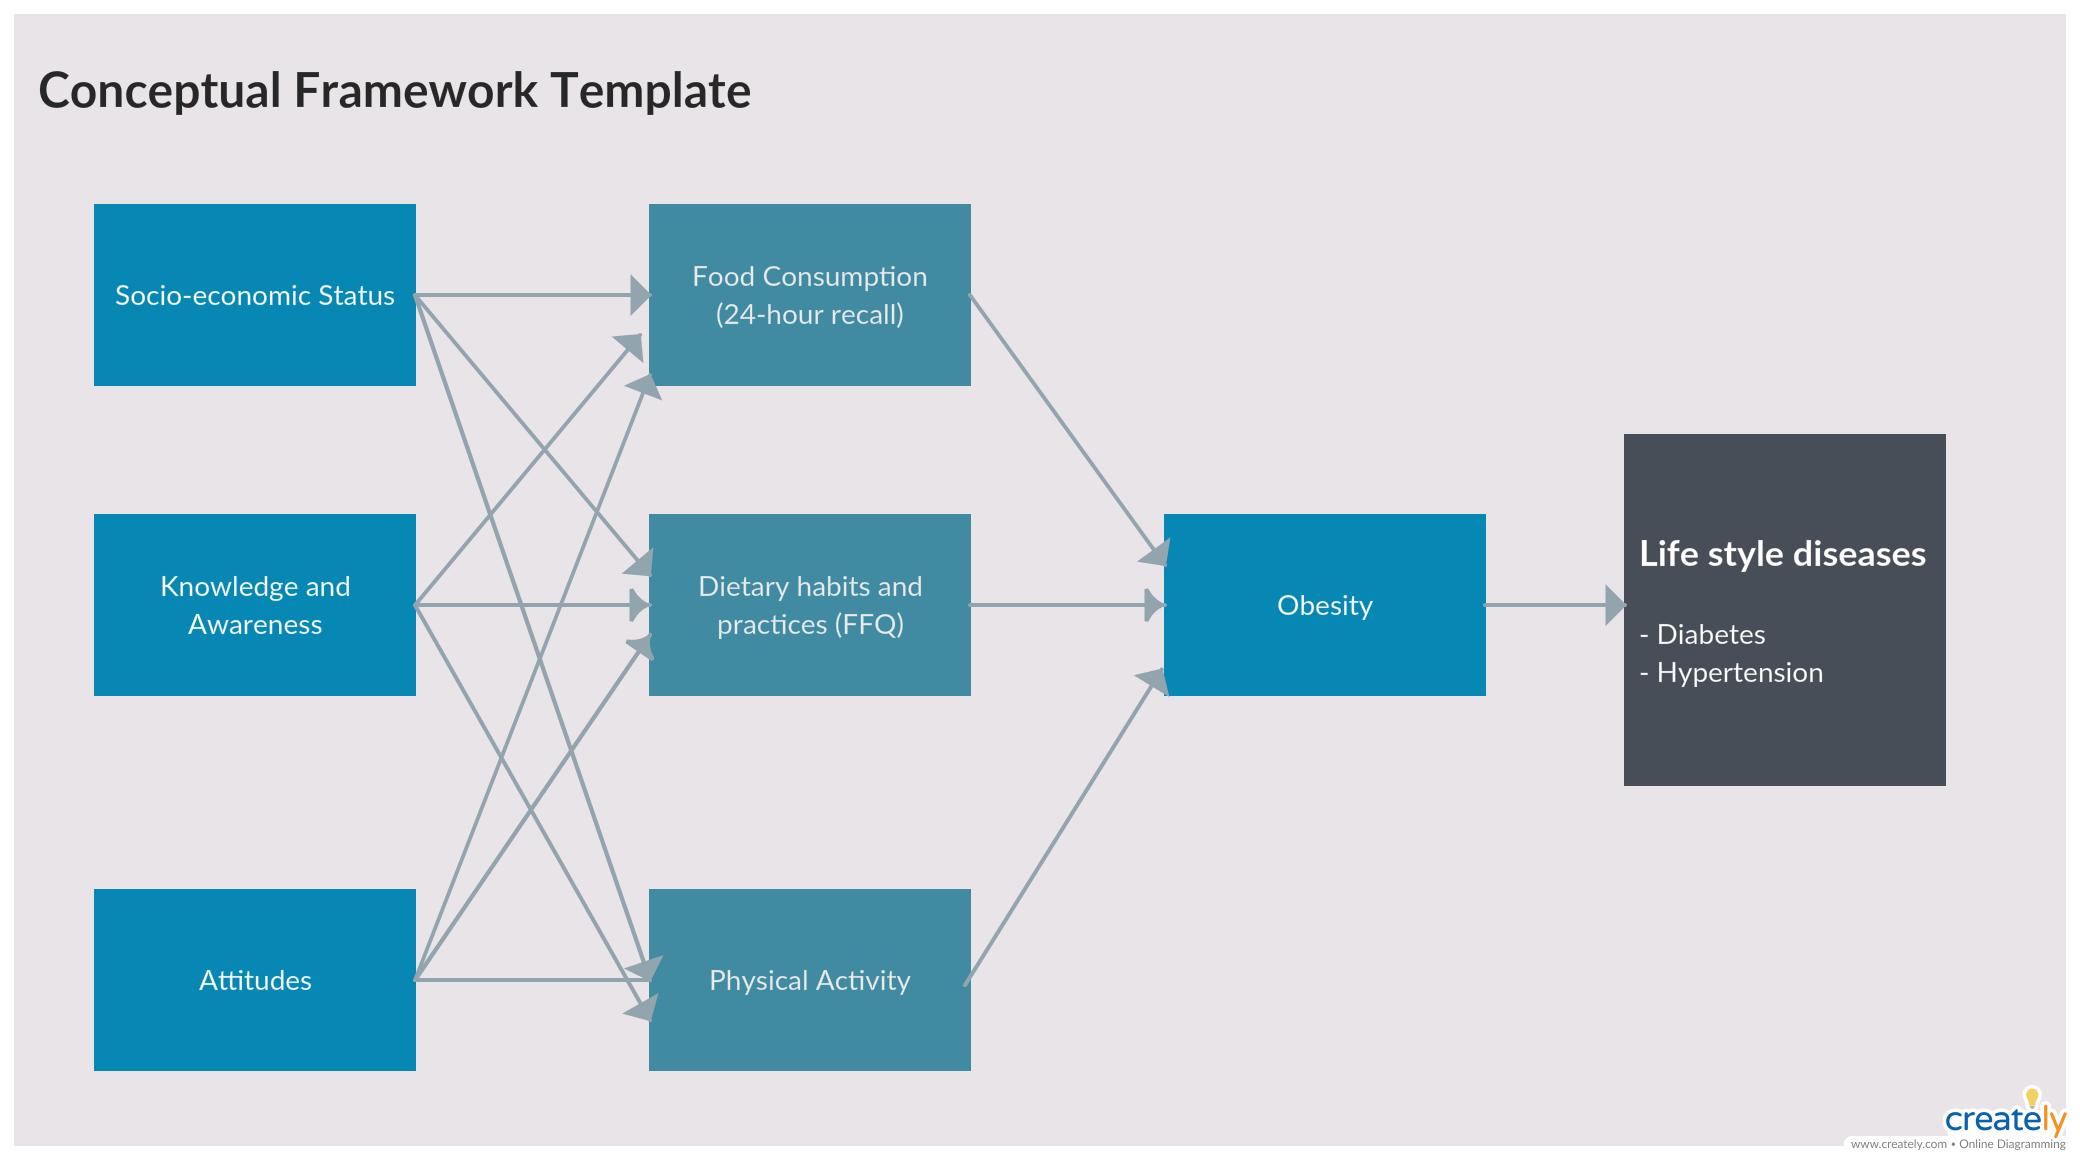 Conceptual Framework Template   Conceptual framework, Conceptual, FrameworkPinterest